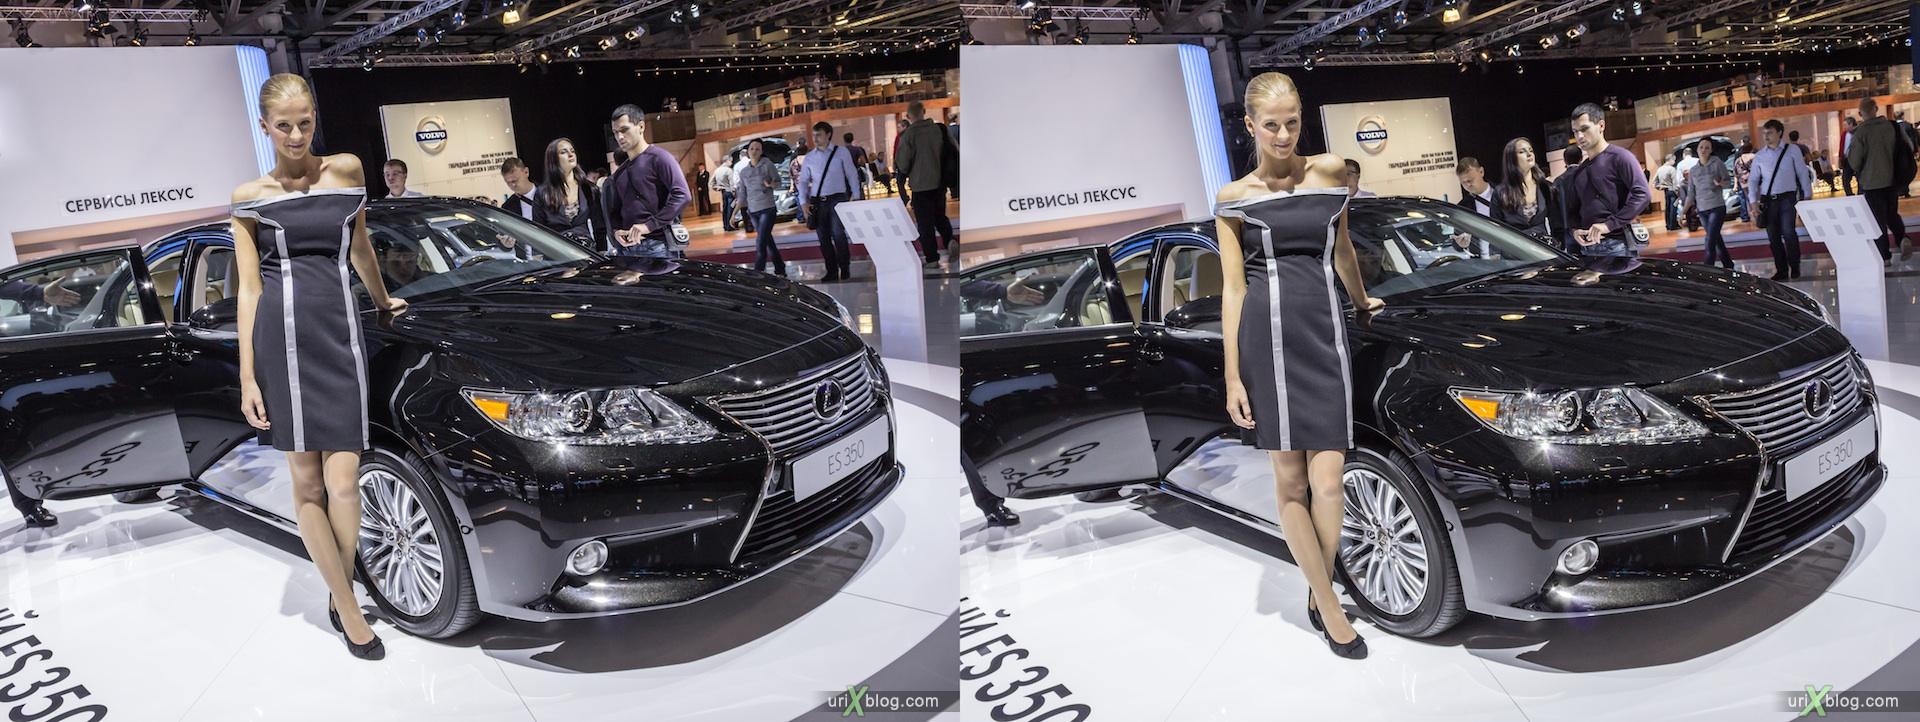 2012, Lexus ES 350, девушка, модель, girl, model, Moscow International Automobile Salon, auto show, 3D, stereo pair, cross-eyed, crossview